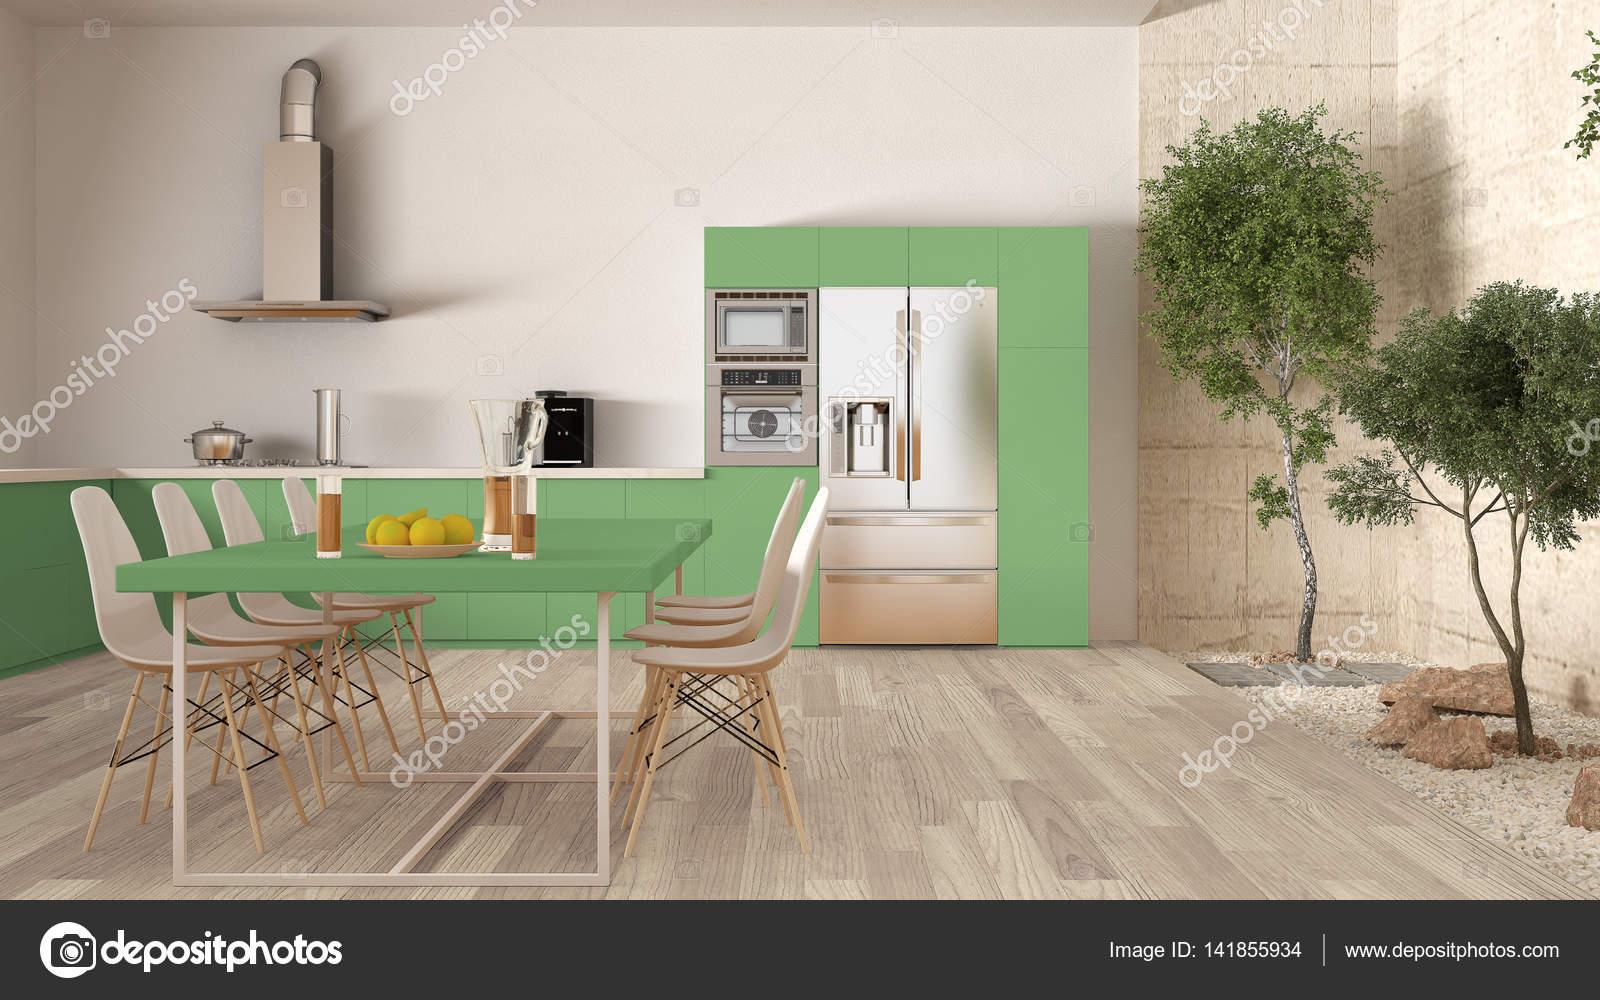 cuisine blanche et verte avec jardin intrieur desi intrieur minimal photo